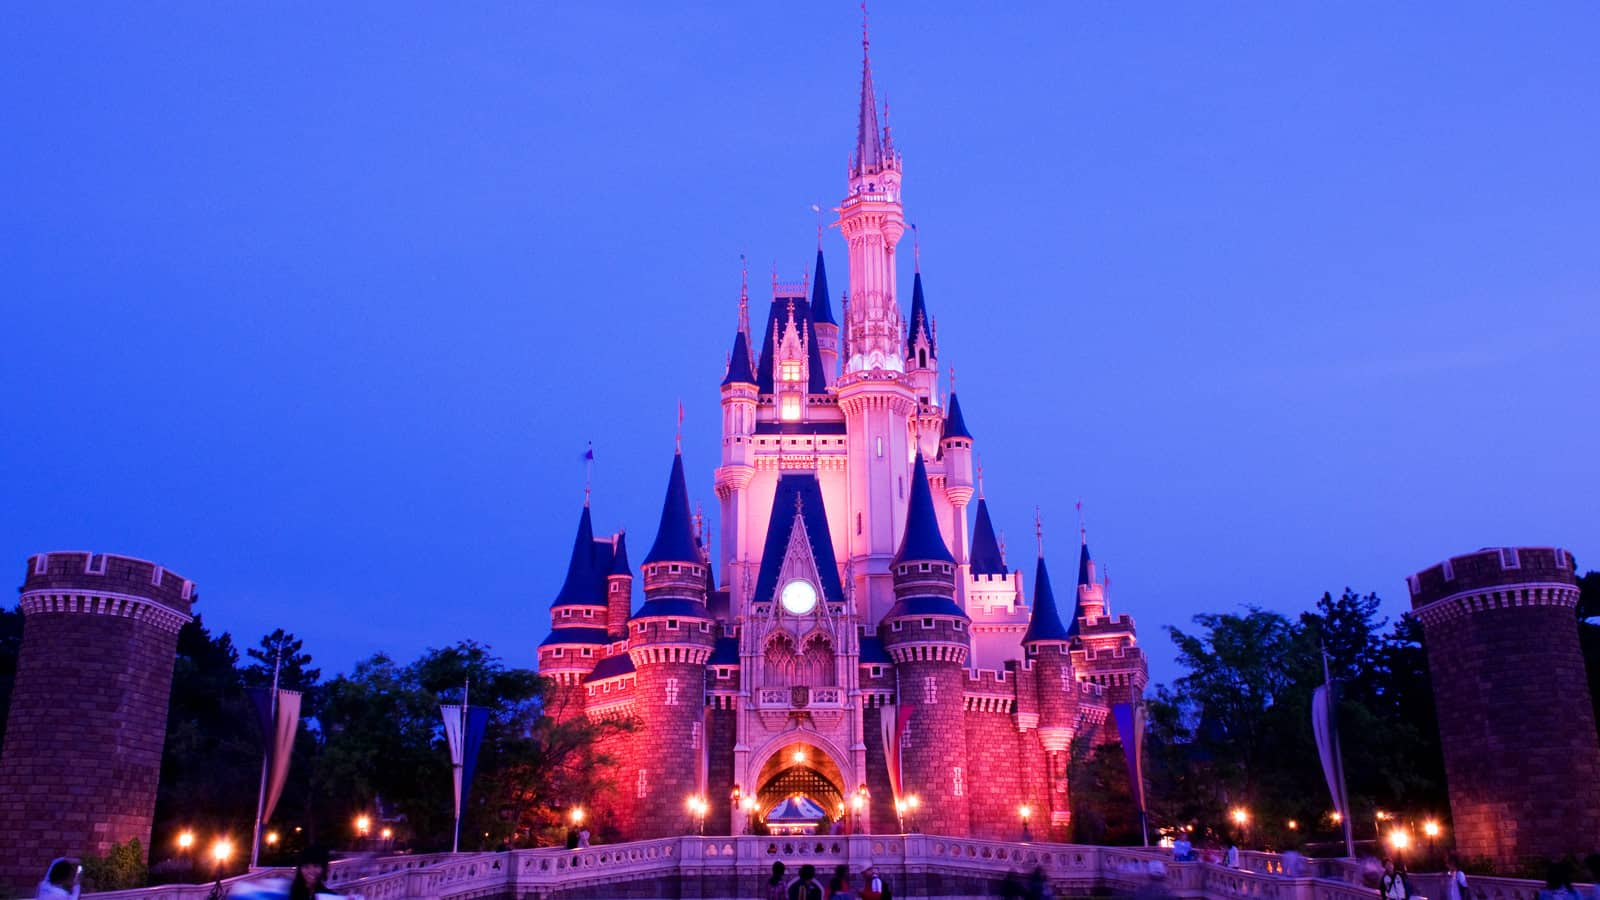 The exterior of Cinderella Castle in Tokyo Disneyland